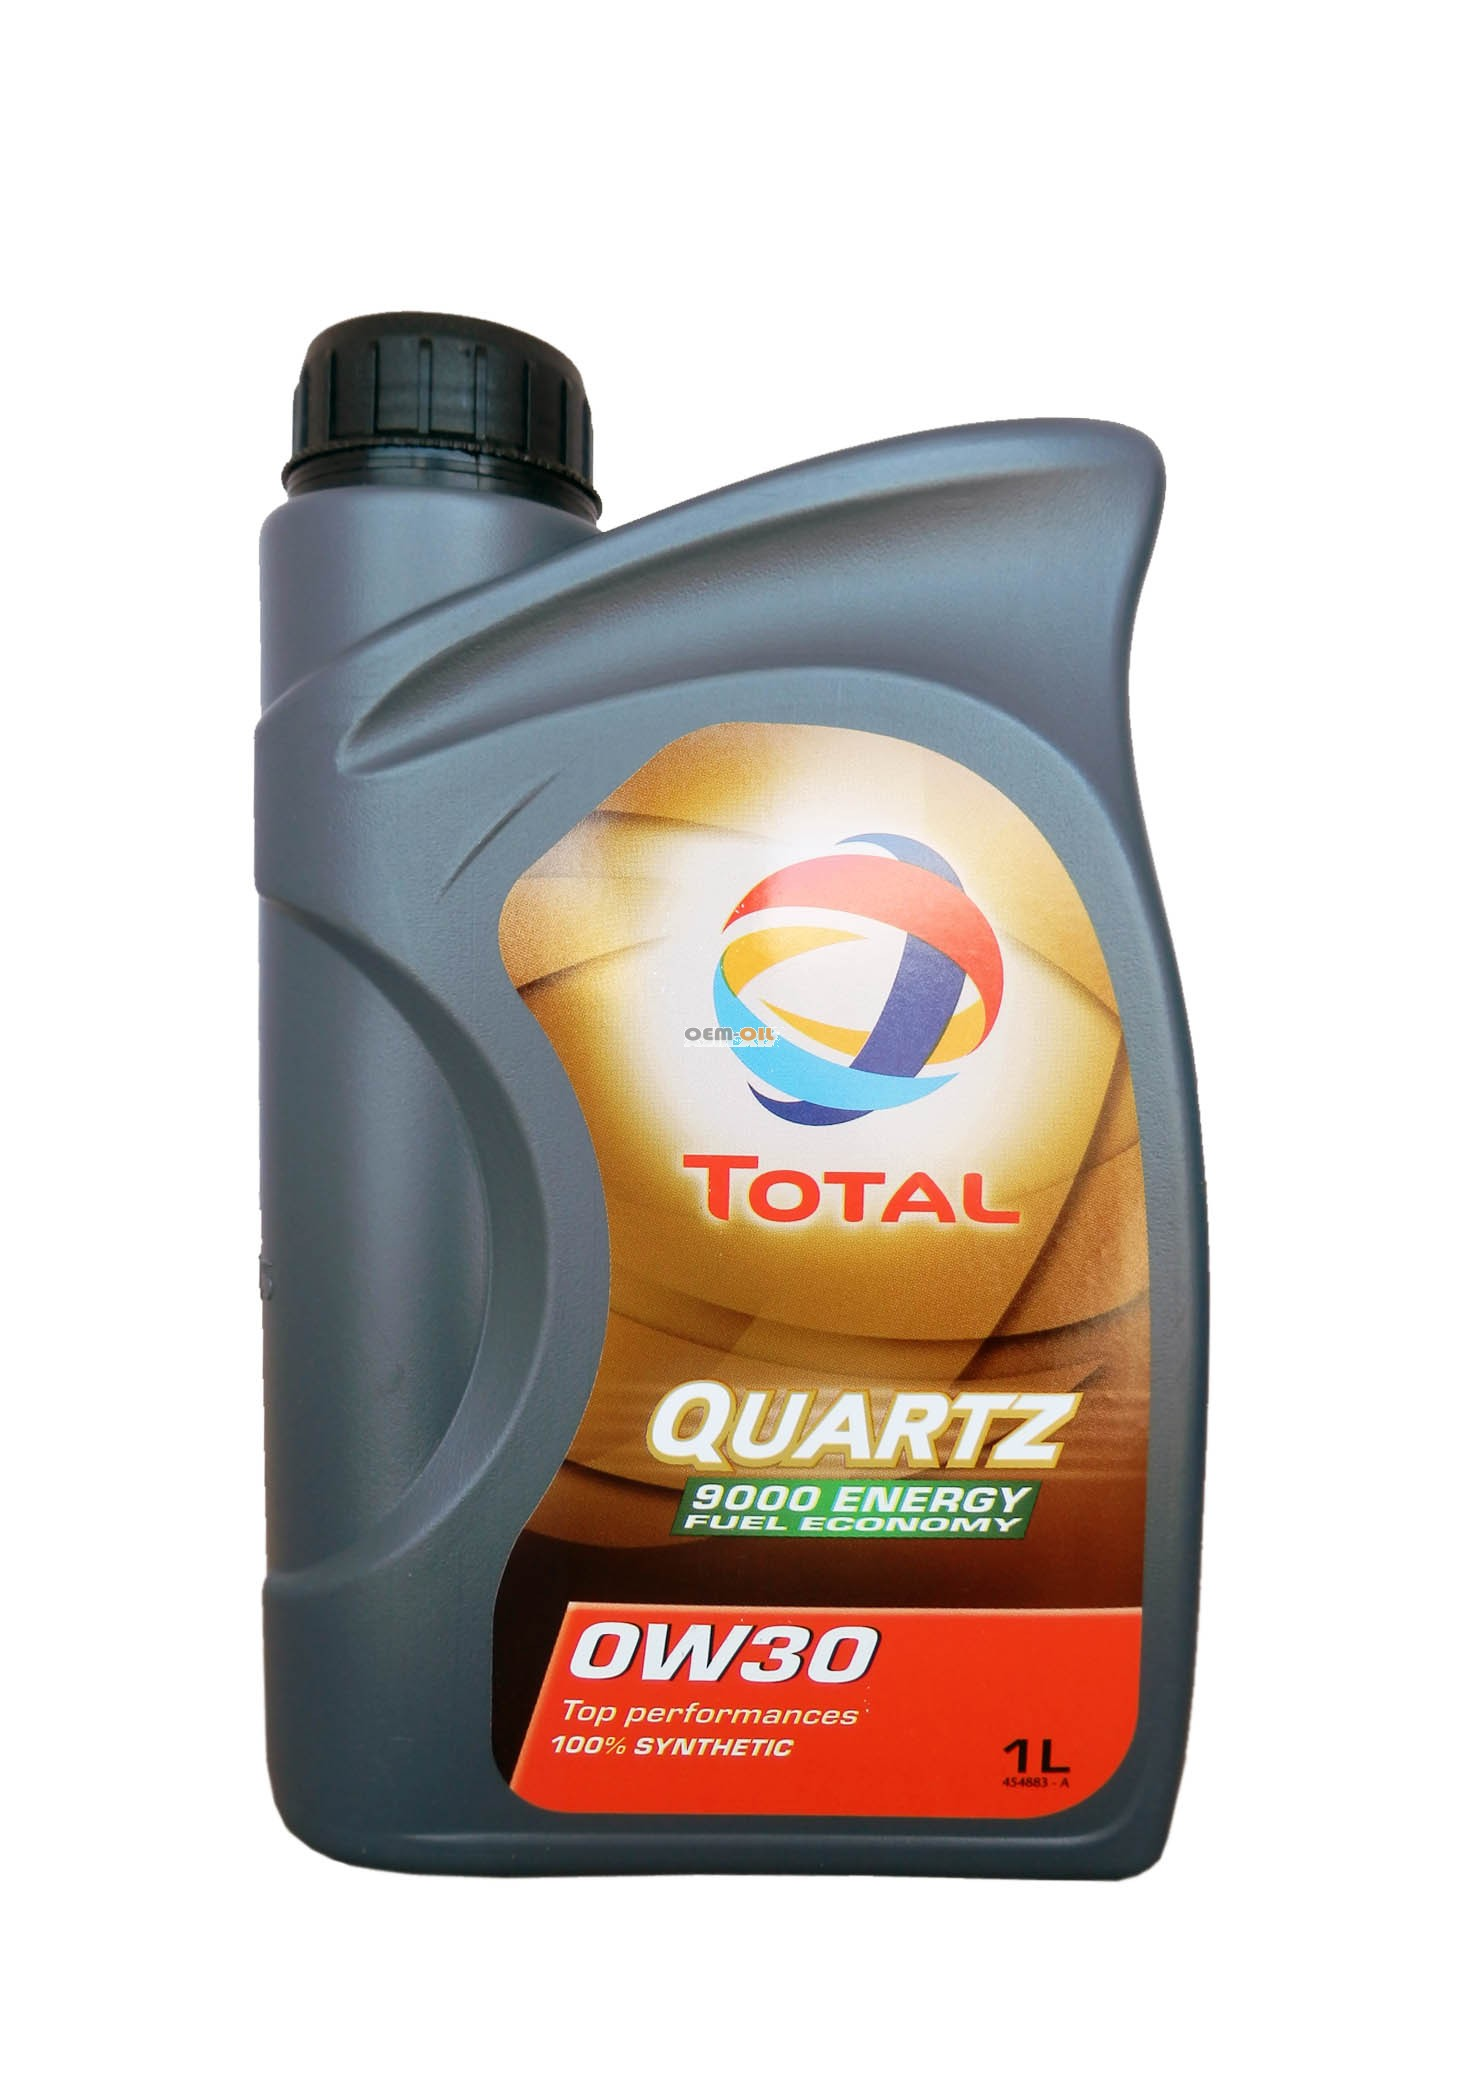 TOTAL QUARTZ 9000 ENERGY 0W-30 (1 л)